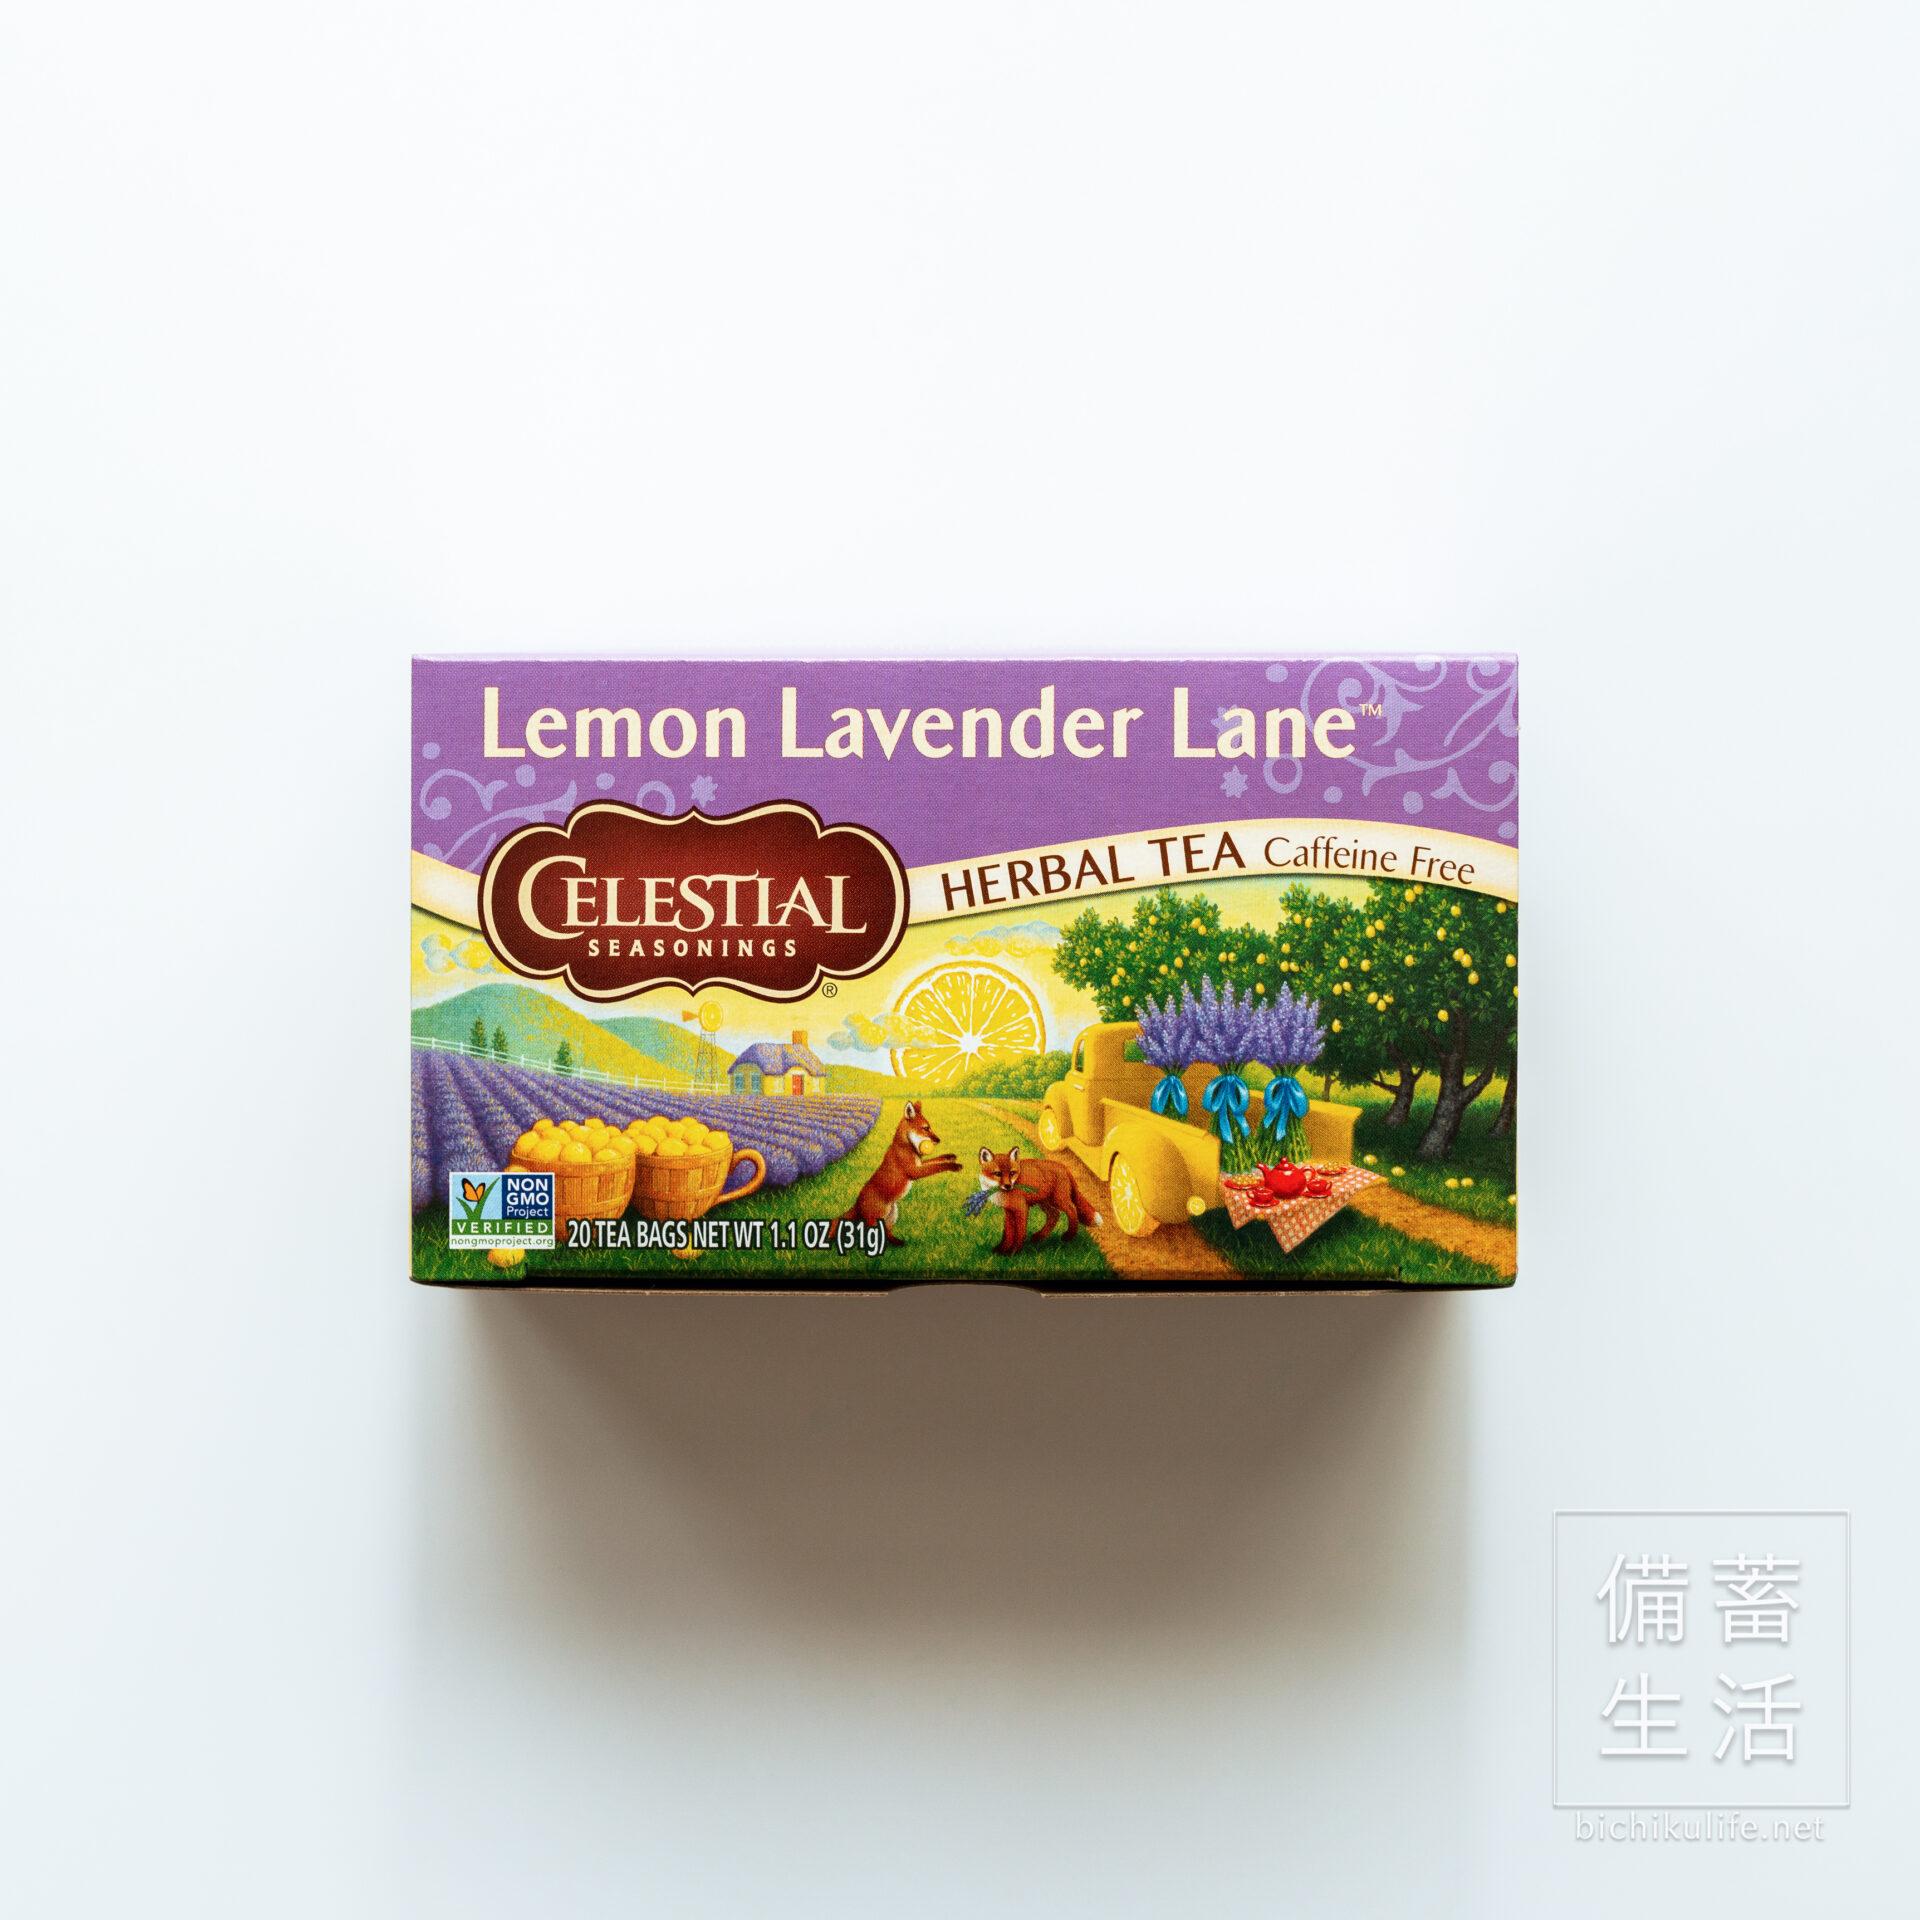 Celestial Seasonings セレッシャルシーズニングスのハーブティー、Lemonlavender lane、レモンラベンダー